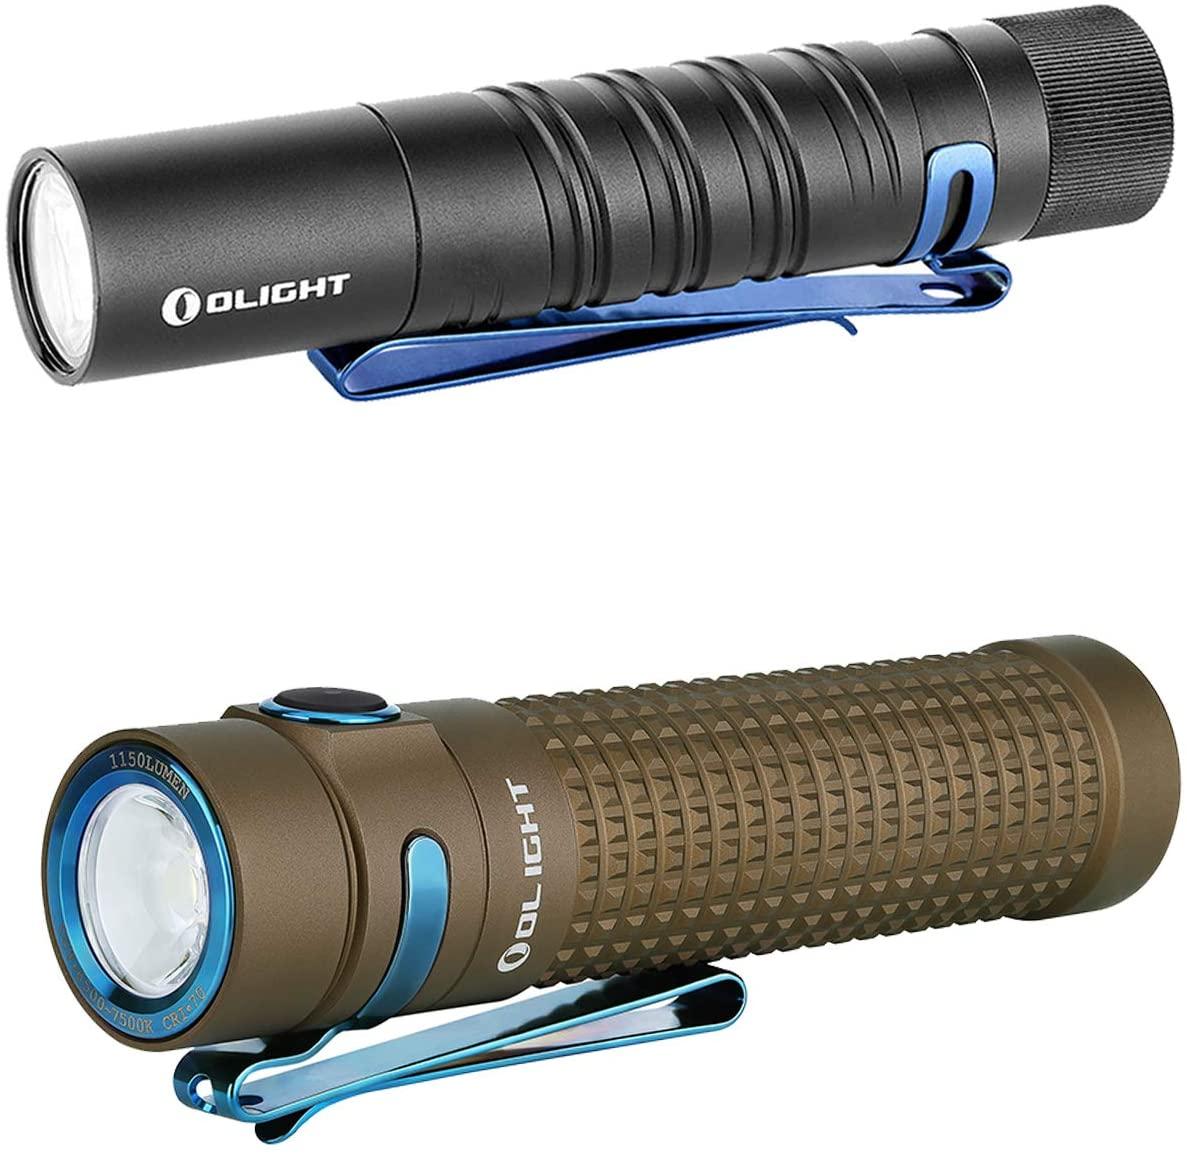 Olight I5T EOS 300 Lumens Slim EDC Tail Switch Flashlight Black, Bundle with S2R II Desert Tan Limited Edition 1150 Lumens Magnetic Rechargeable Flashligh